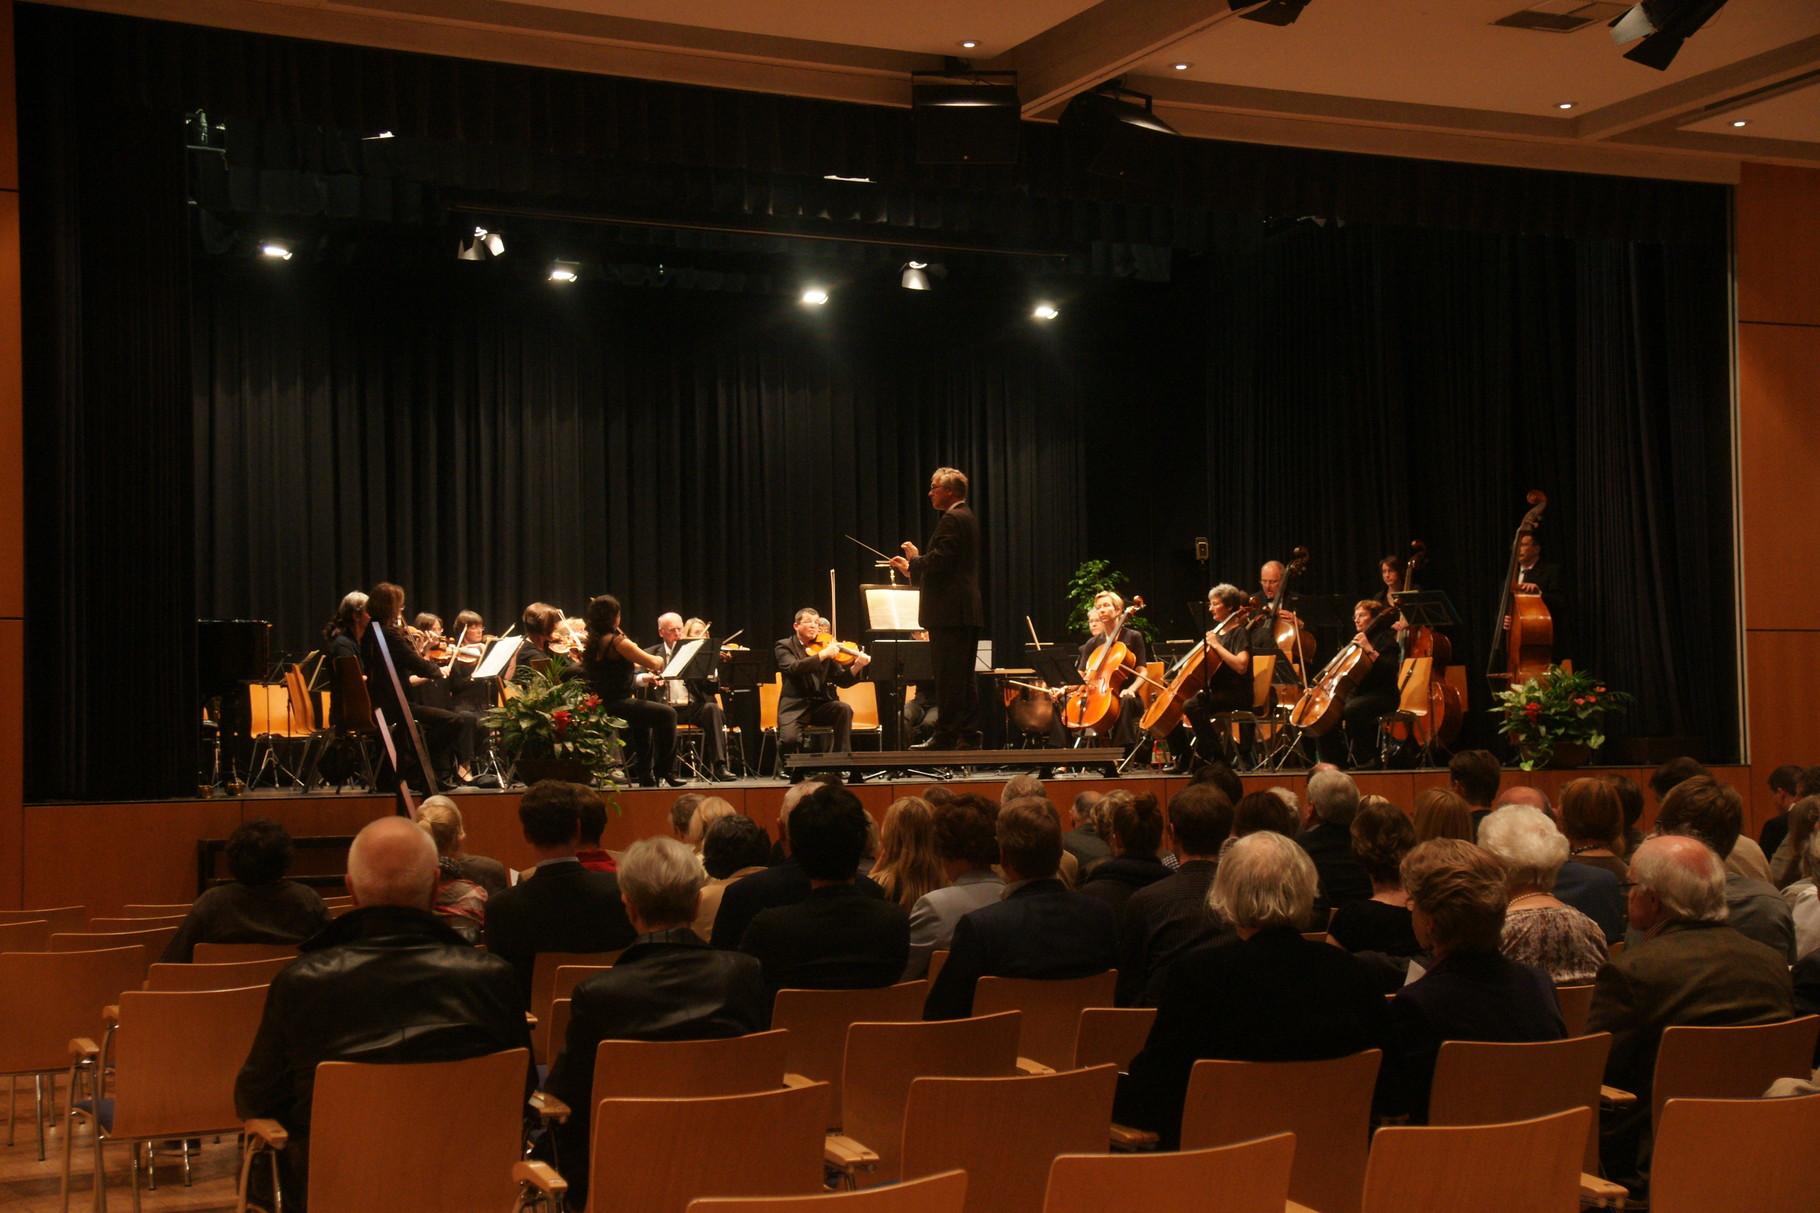 Konzert Bad Vilbel-Dortelweil  2012